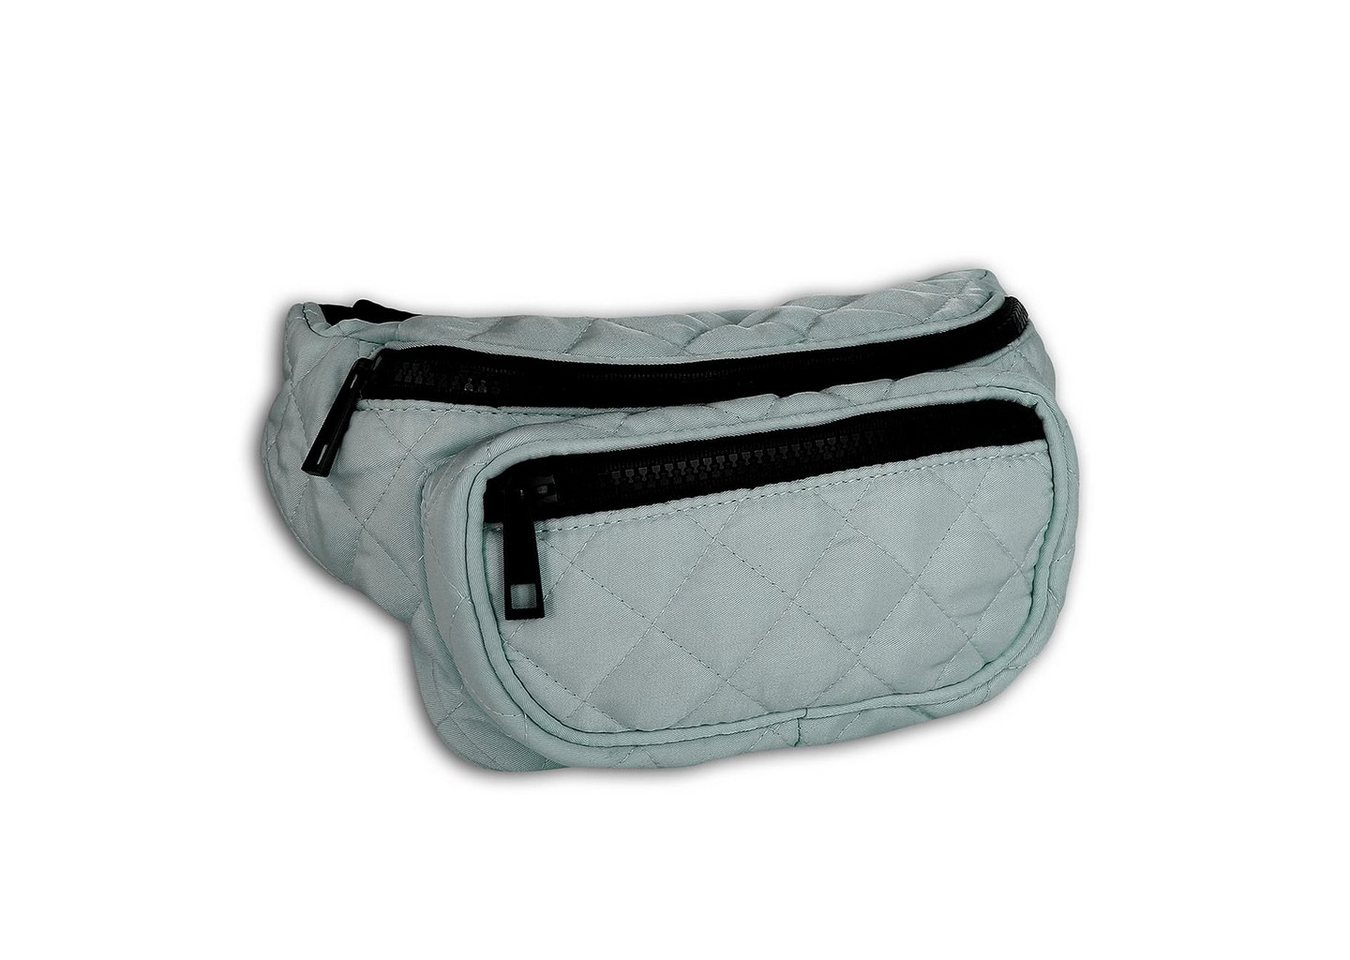 new bags -  Gürteltasche »OTD5026X  Damen Hüfttasche Gürteltasche« (Gürteltasche), Damen, Jugend Tasche silber, grau, ca. 24cm x ca. 10cm